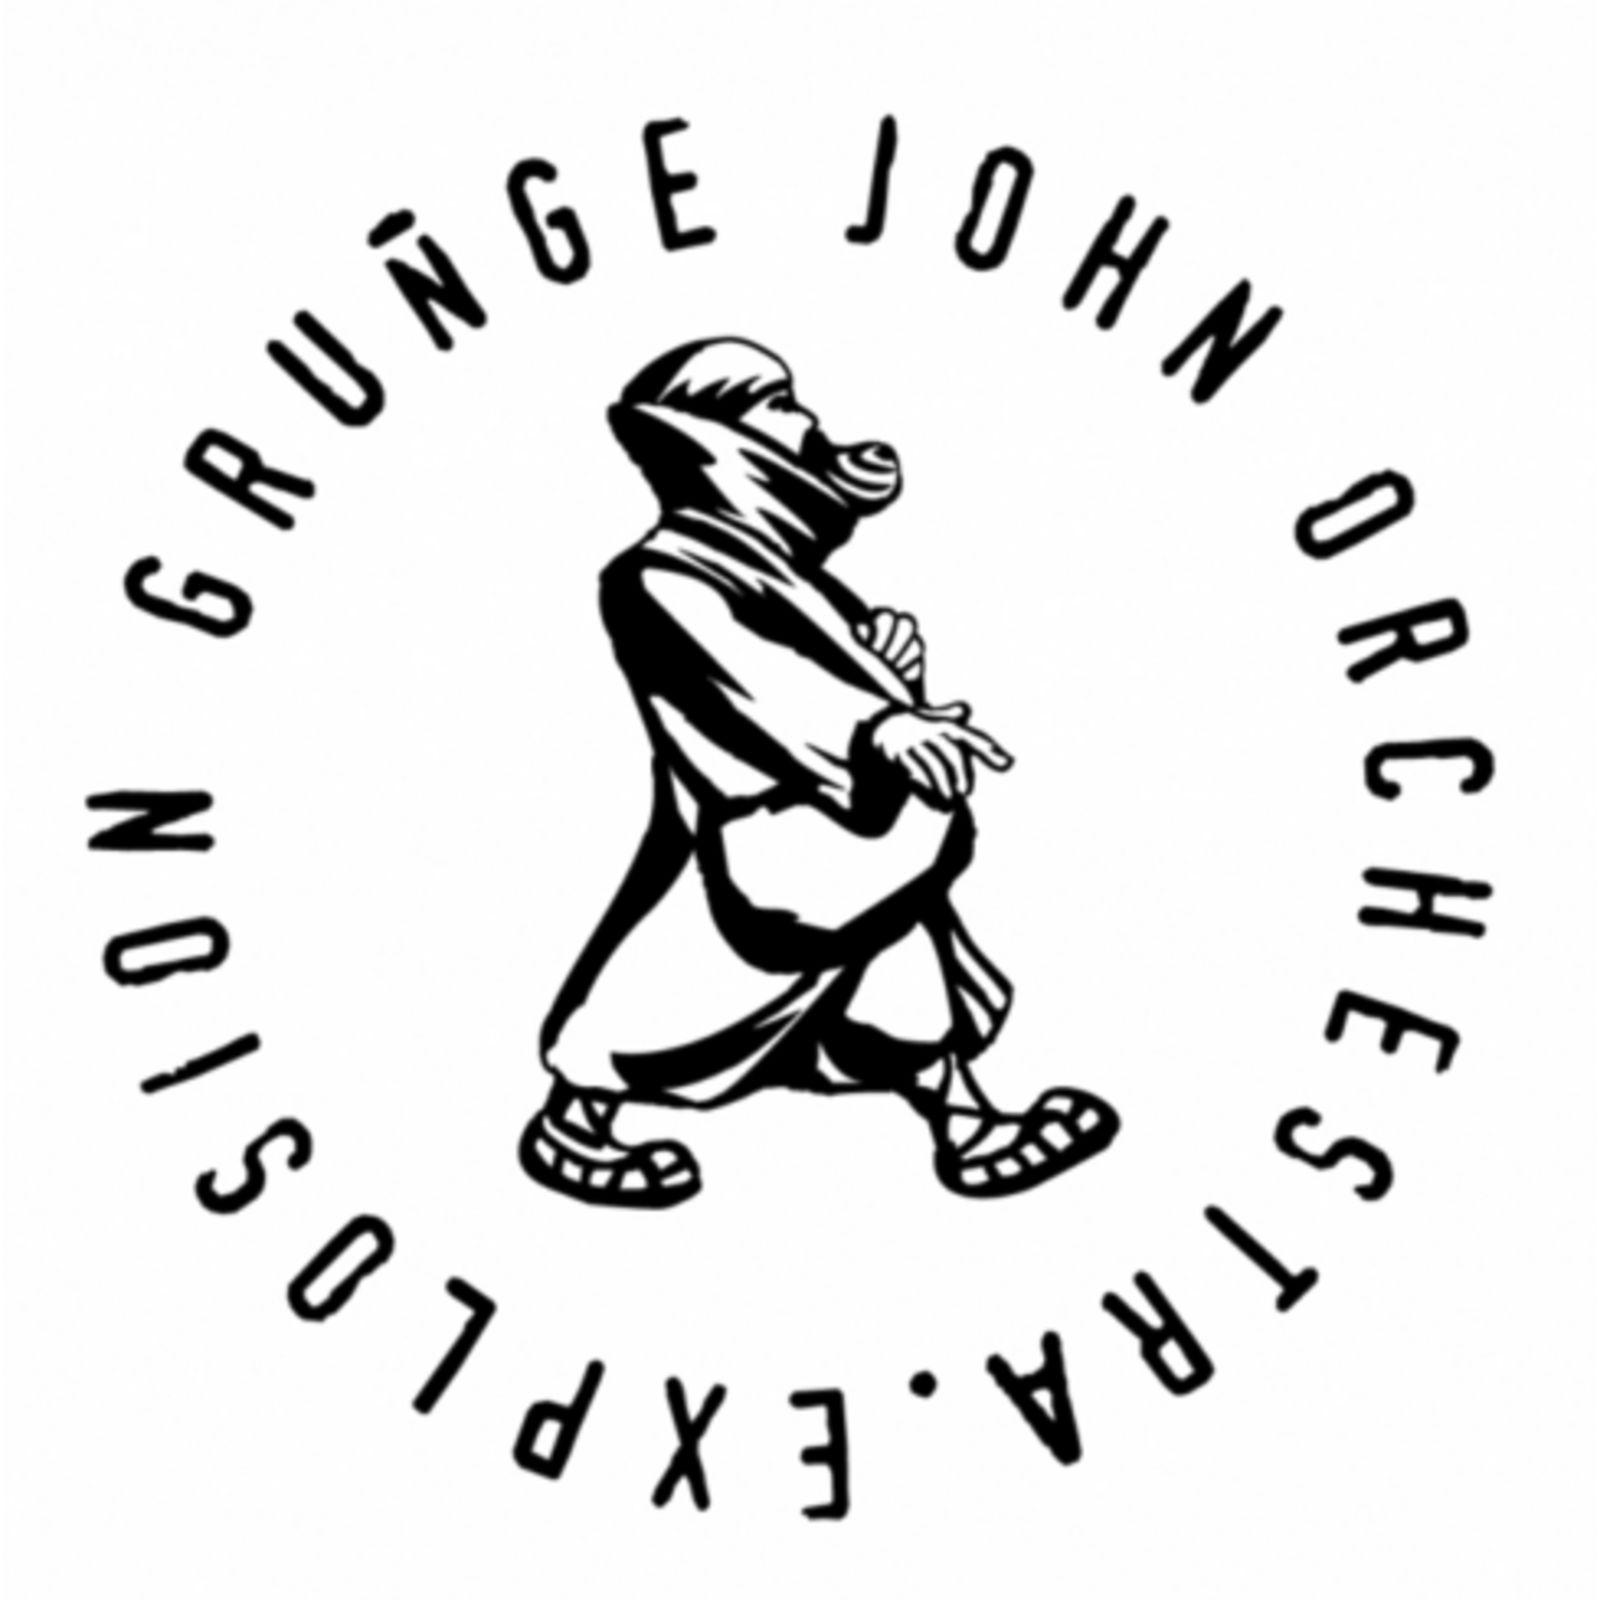 GJO.E GRUNGE JOHN ORCHESTRA EXPLOSION